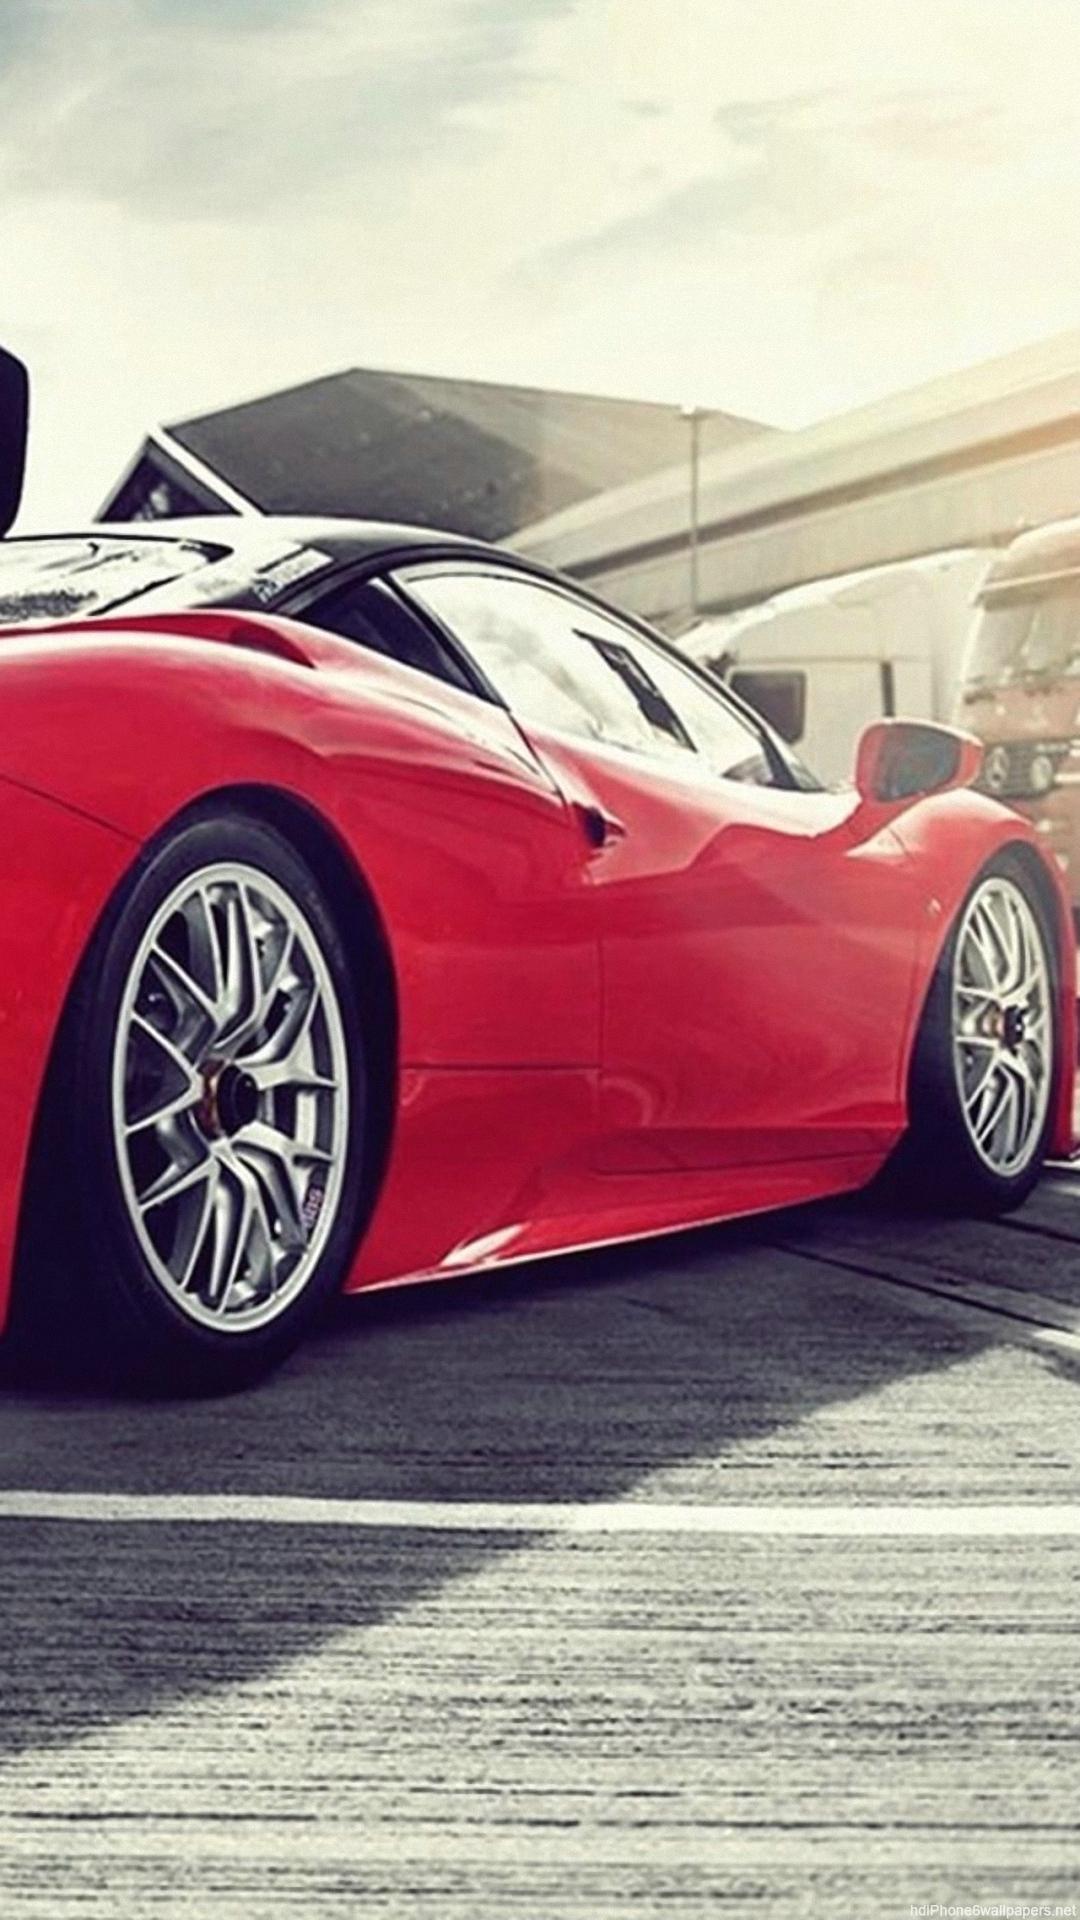 Lamborghini Aventador Hd Wallpapers 1080p Car Wallpapers For Android Pixelstalk Net